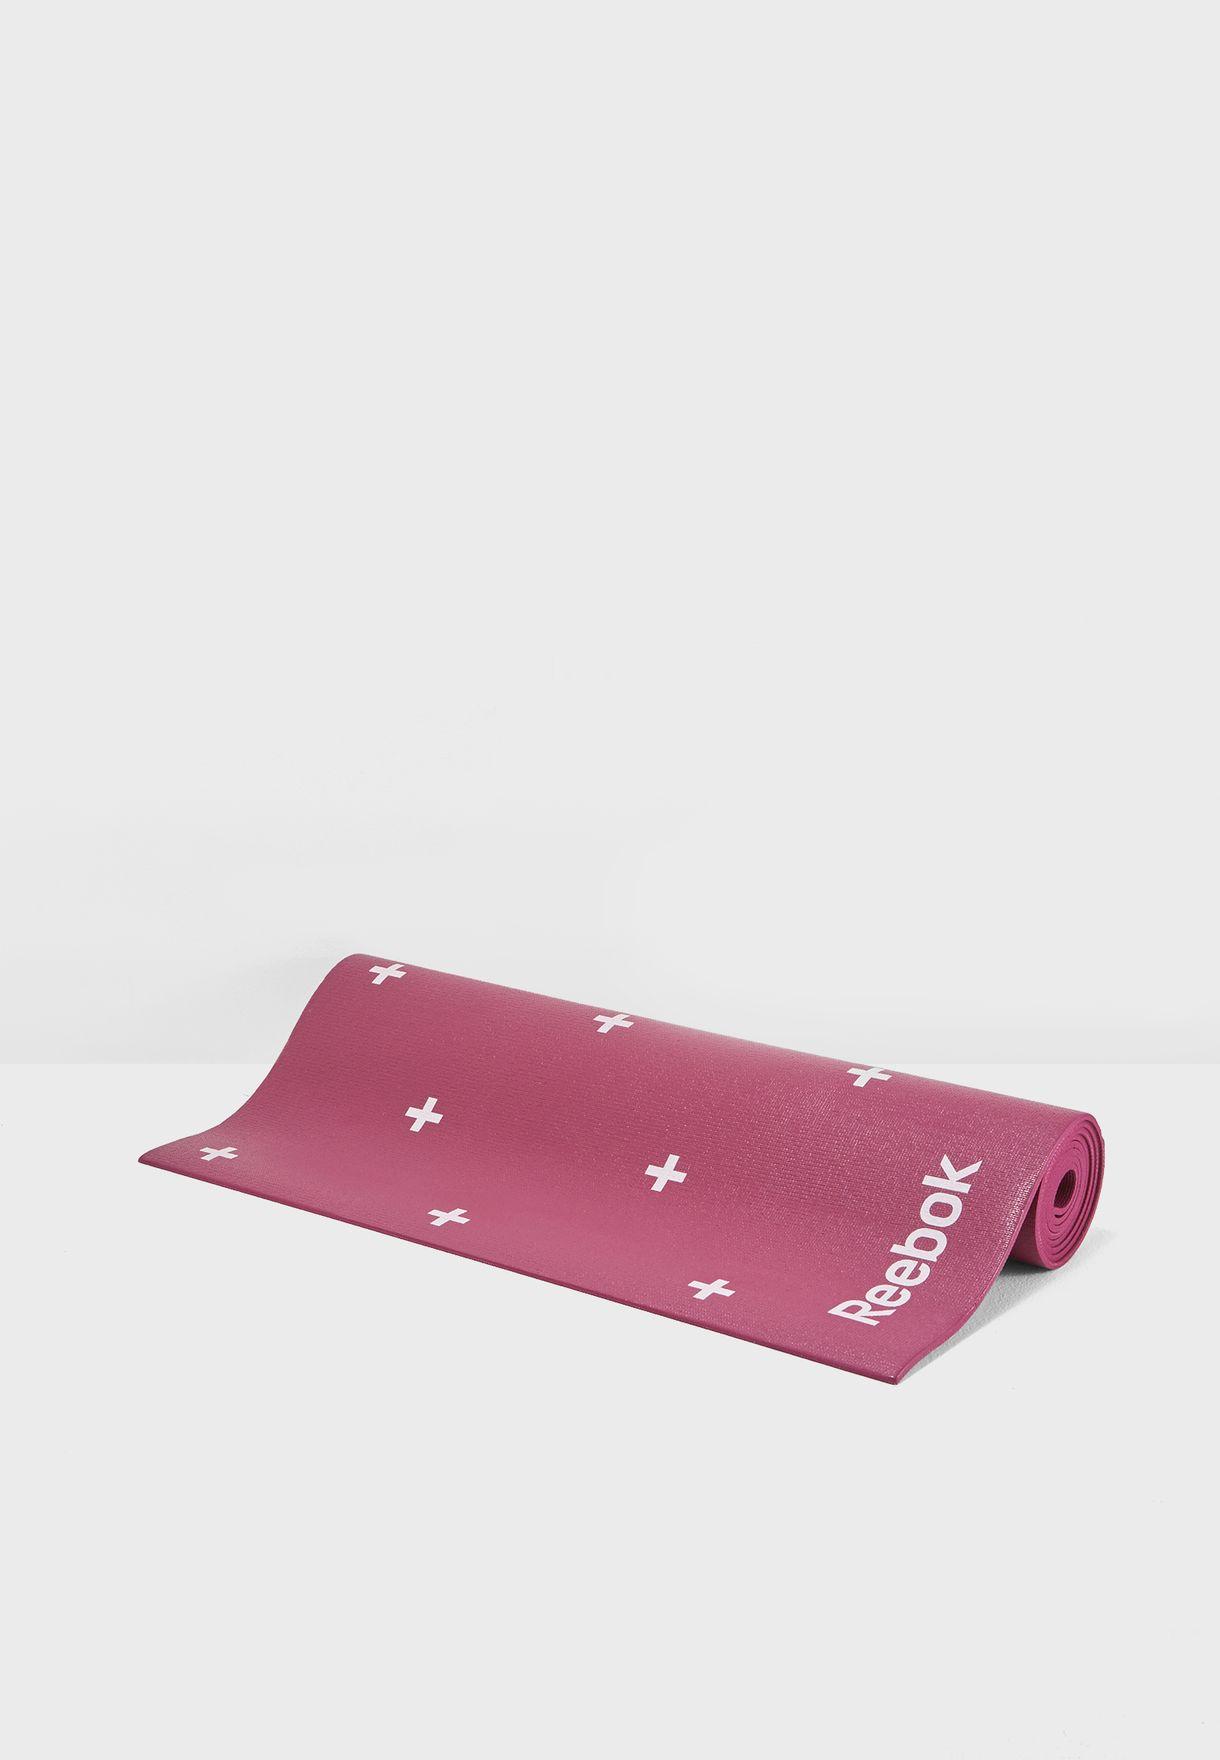 Double Sided Print Yoga Mat